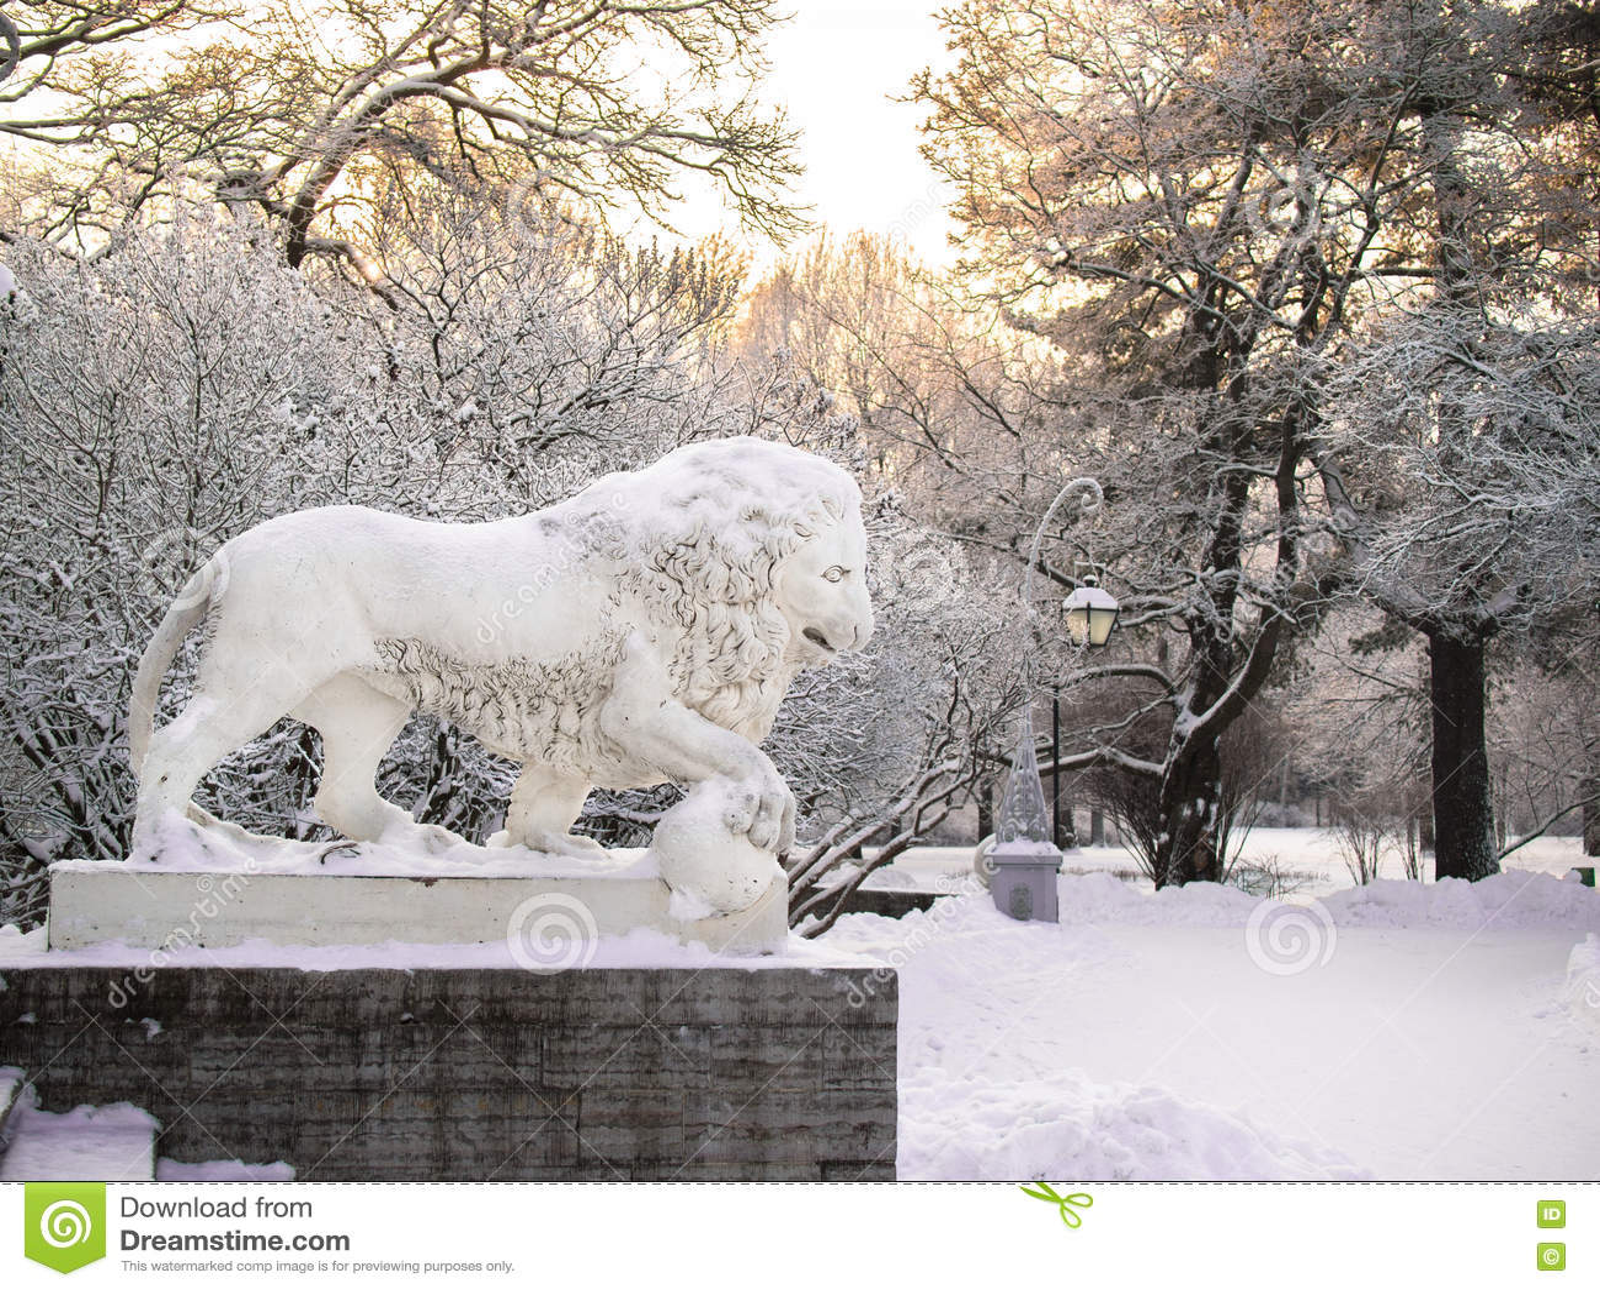 Tonad bildskulptur av ett lejonanseende på en sockel i vintern i St Petersburg mot bakgrunden av dettäckte trädet